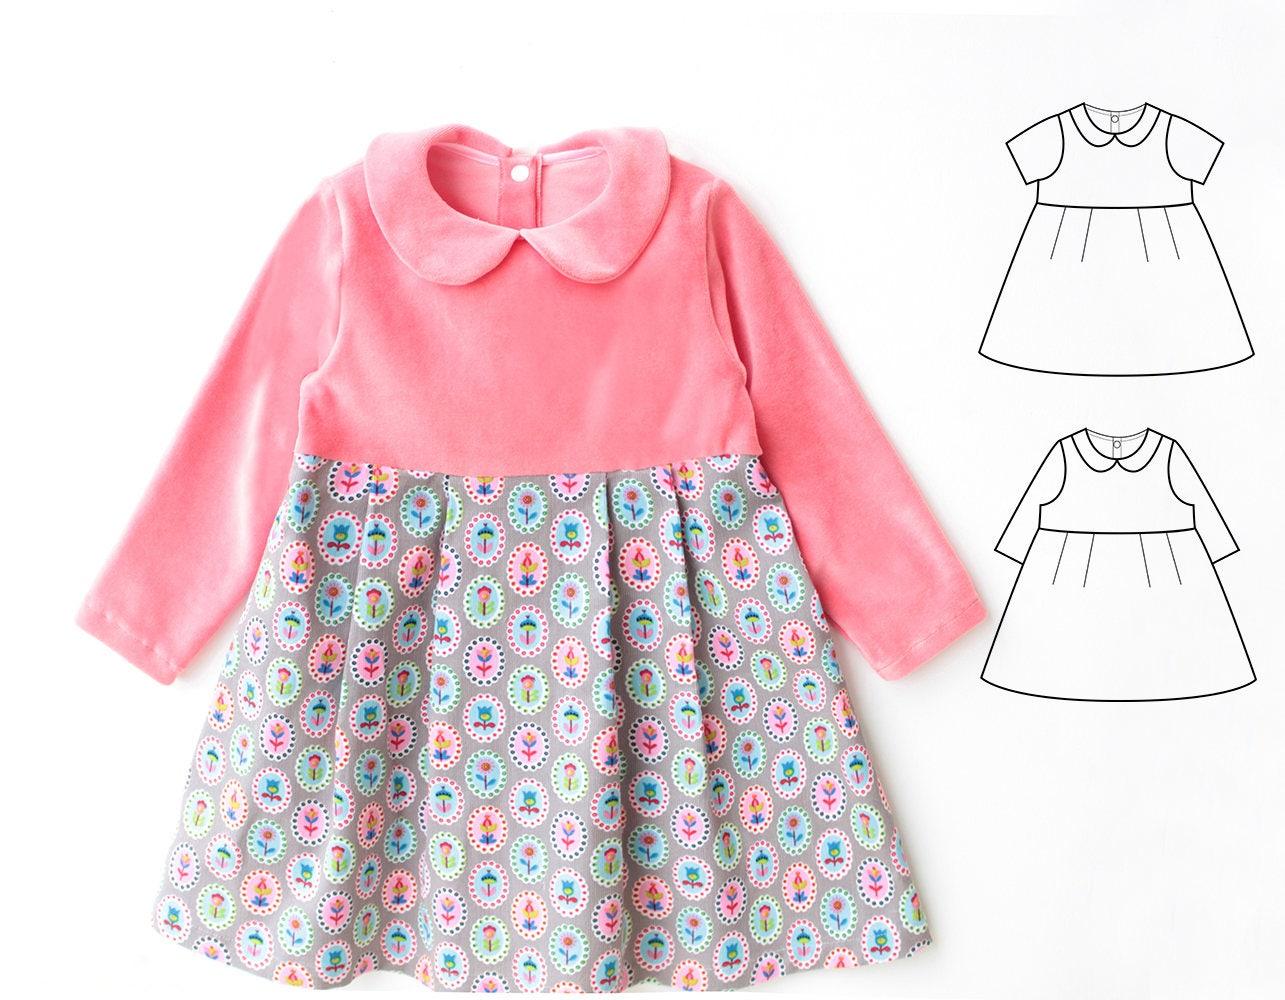 PAULINE Girl Baby Girl Dress sewing pattern Pdf Jersey Knit